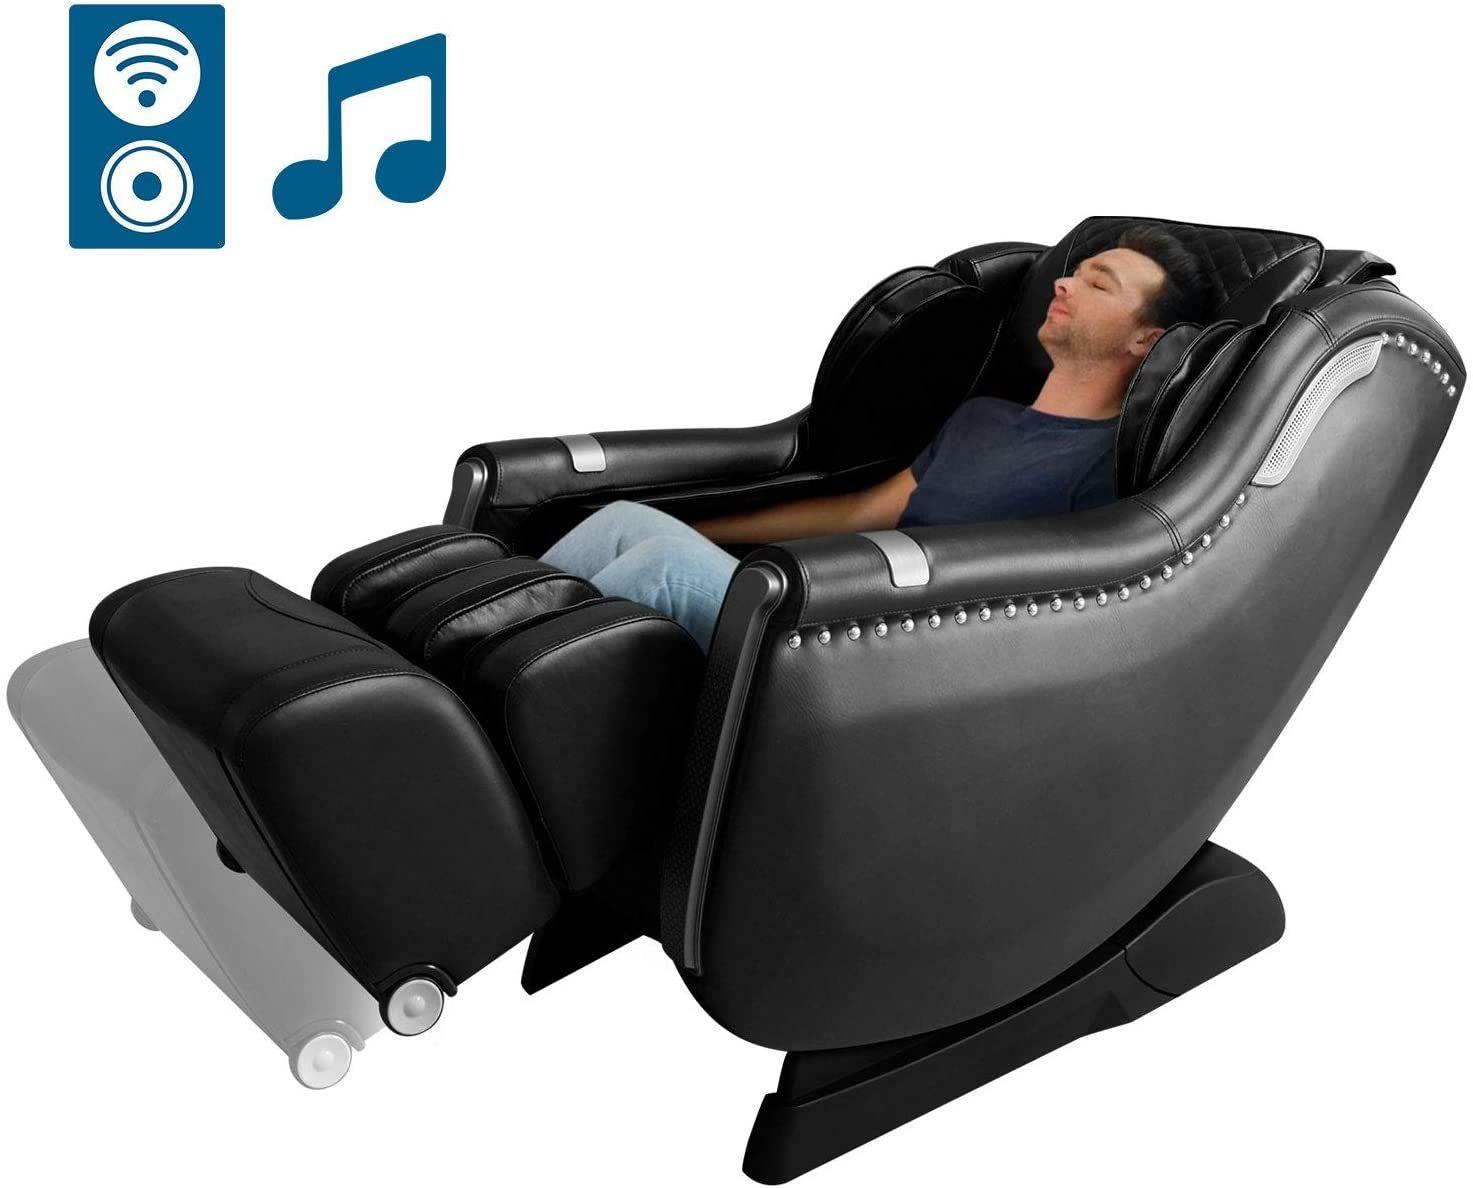 Ktn Massage Chairs Zero Gravity Massage Chair Full Body Shiatsu Massage Chair Recliner With Space Saving Yoga St Massage Chair Shiatsu Massage Chair Massage